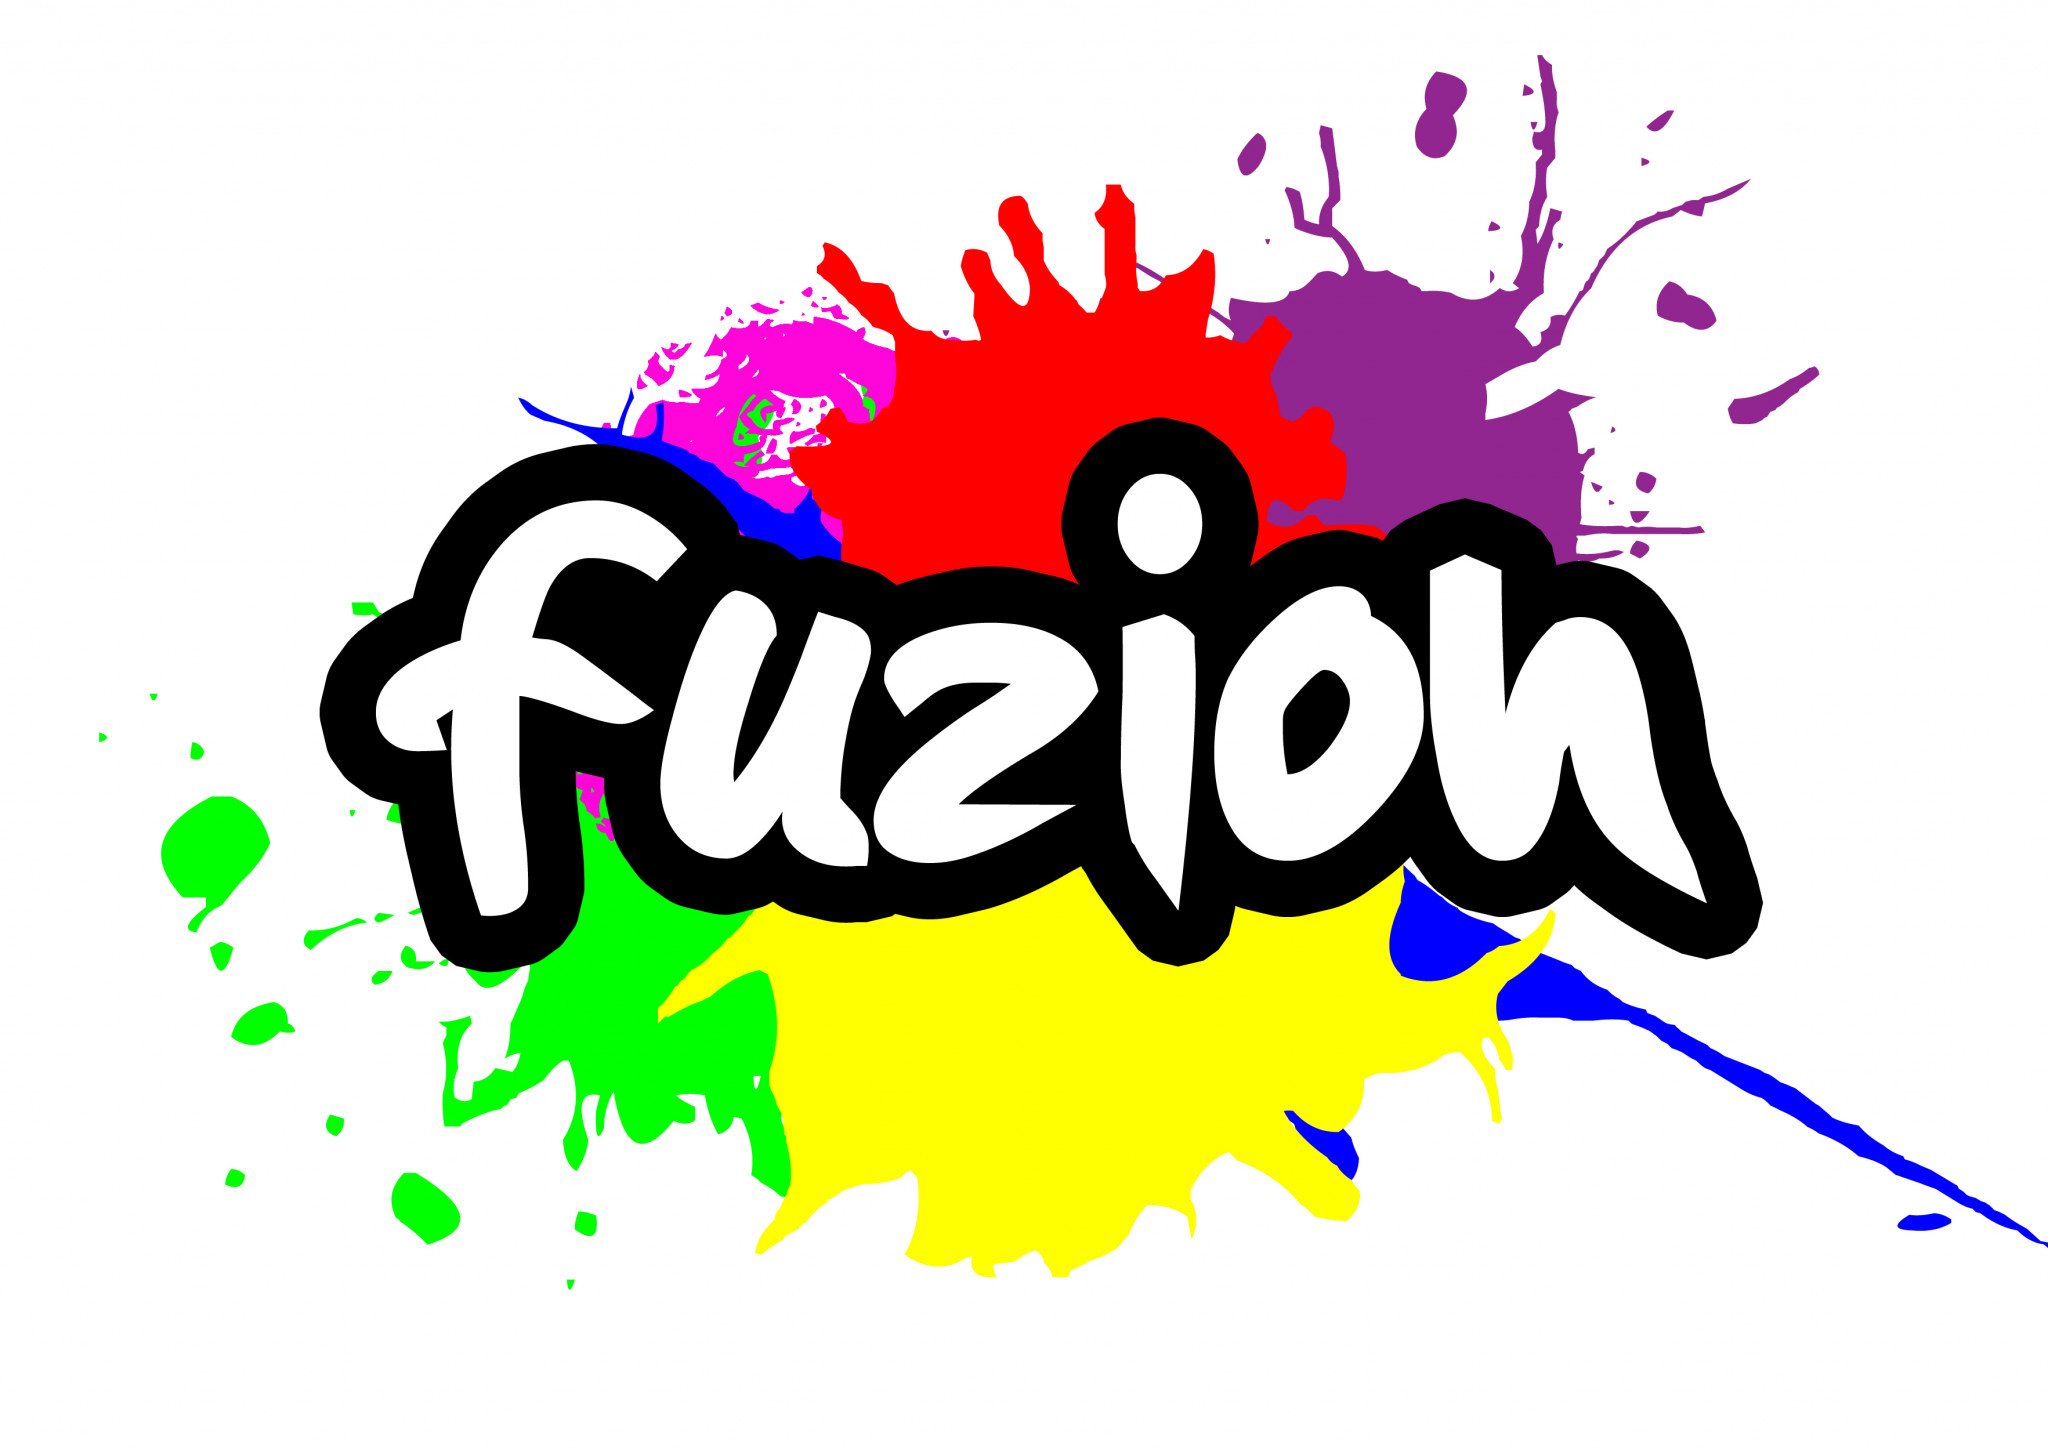 fuzion_logo